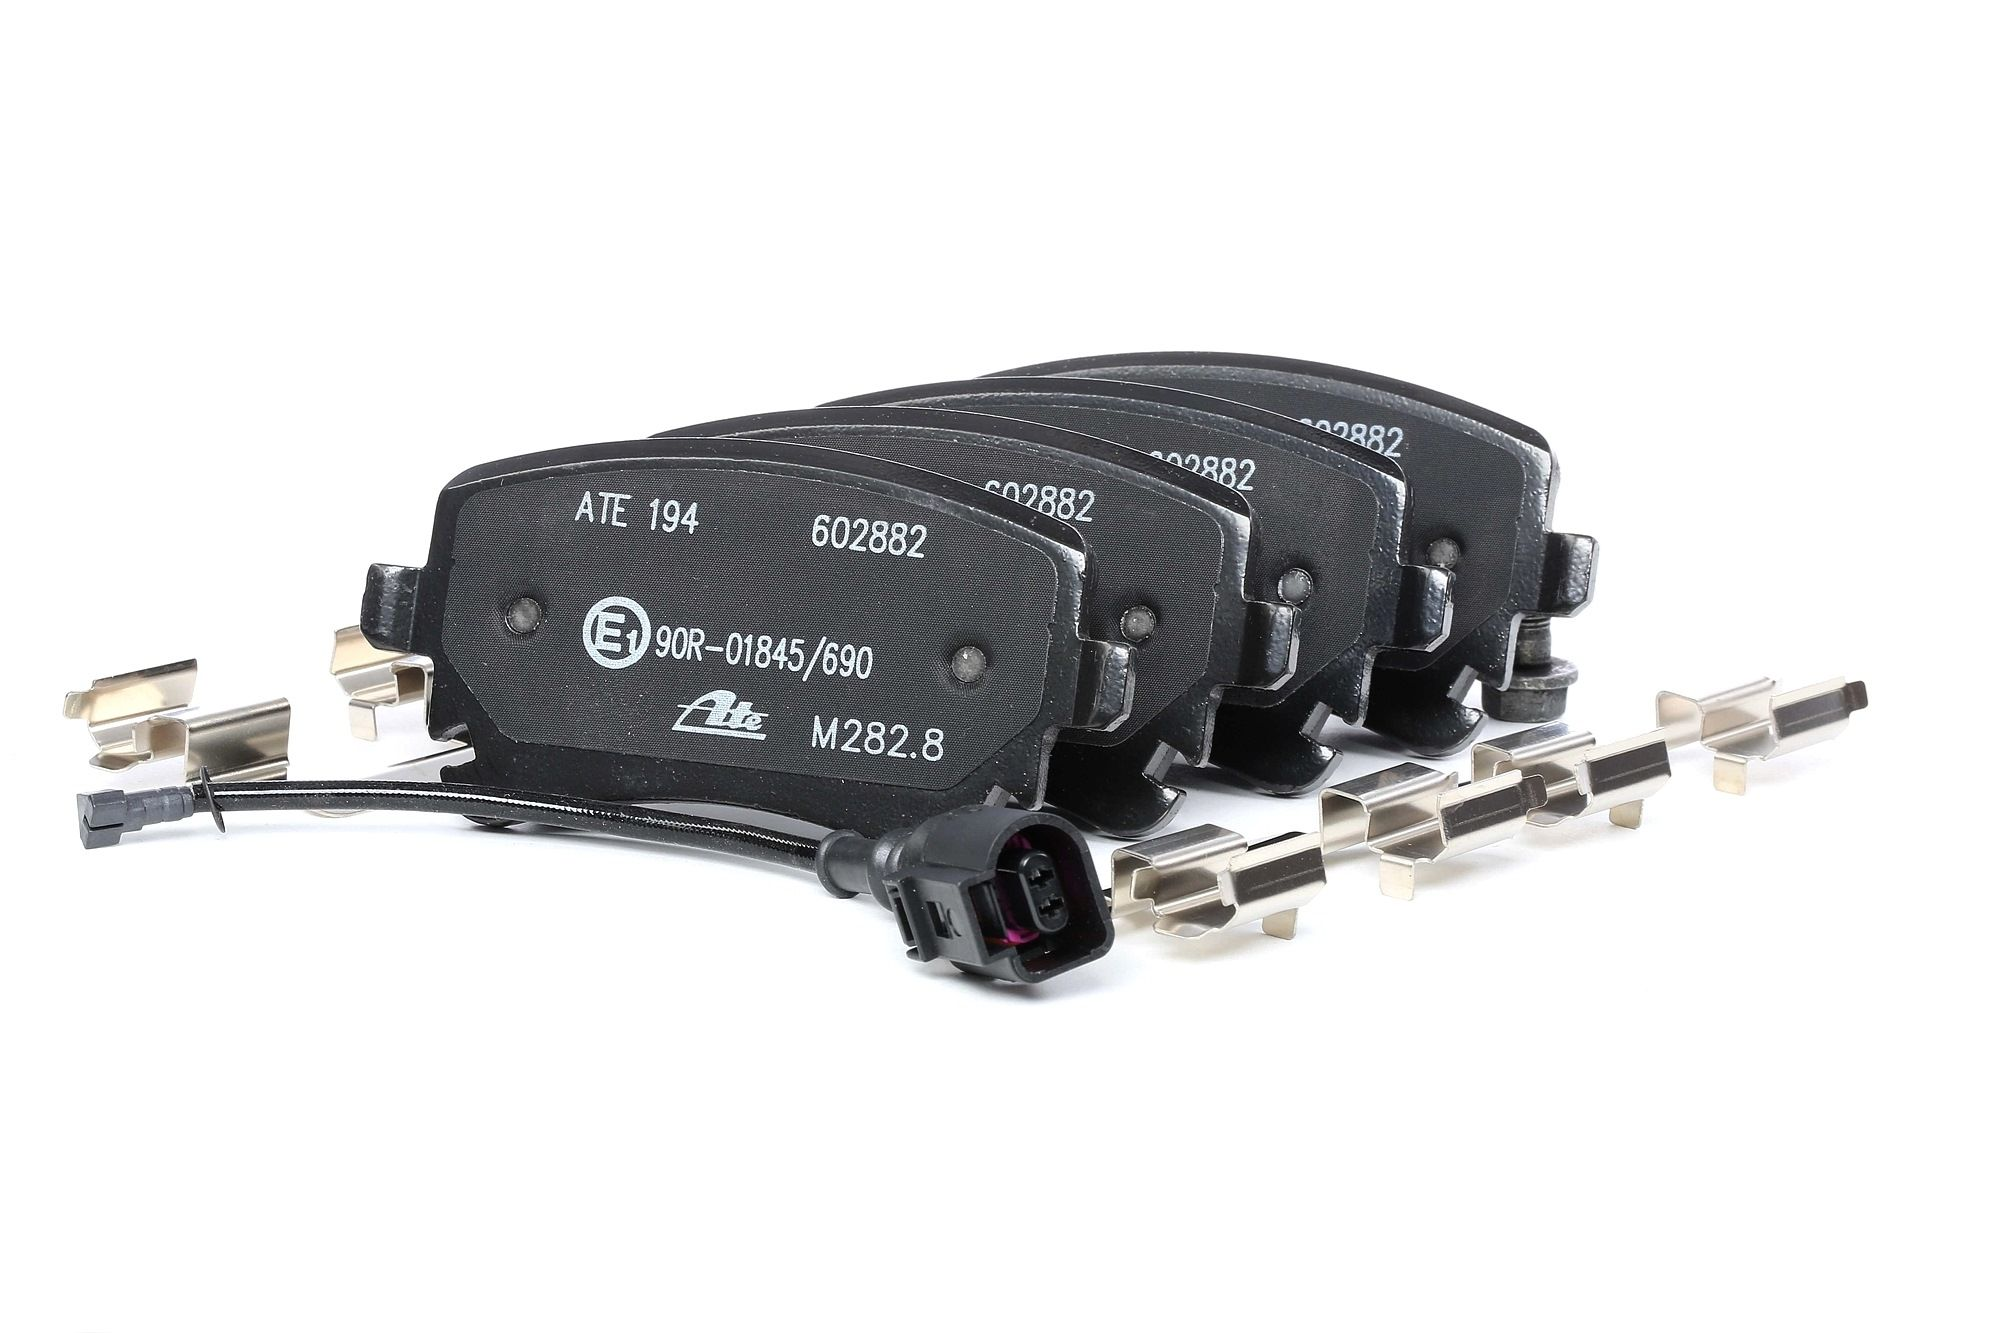 Bremsbelagsatz ATE 602882 Bewertung